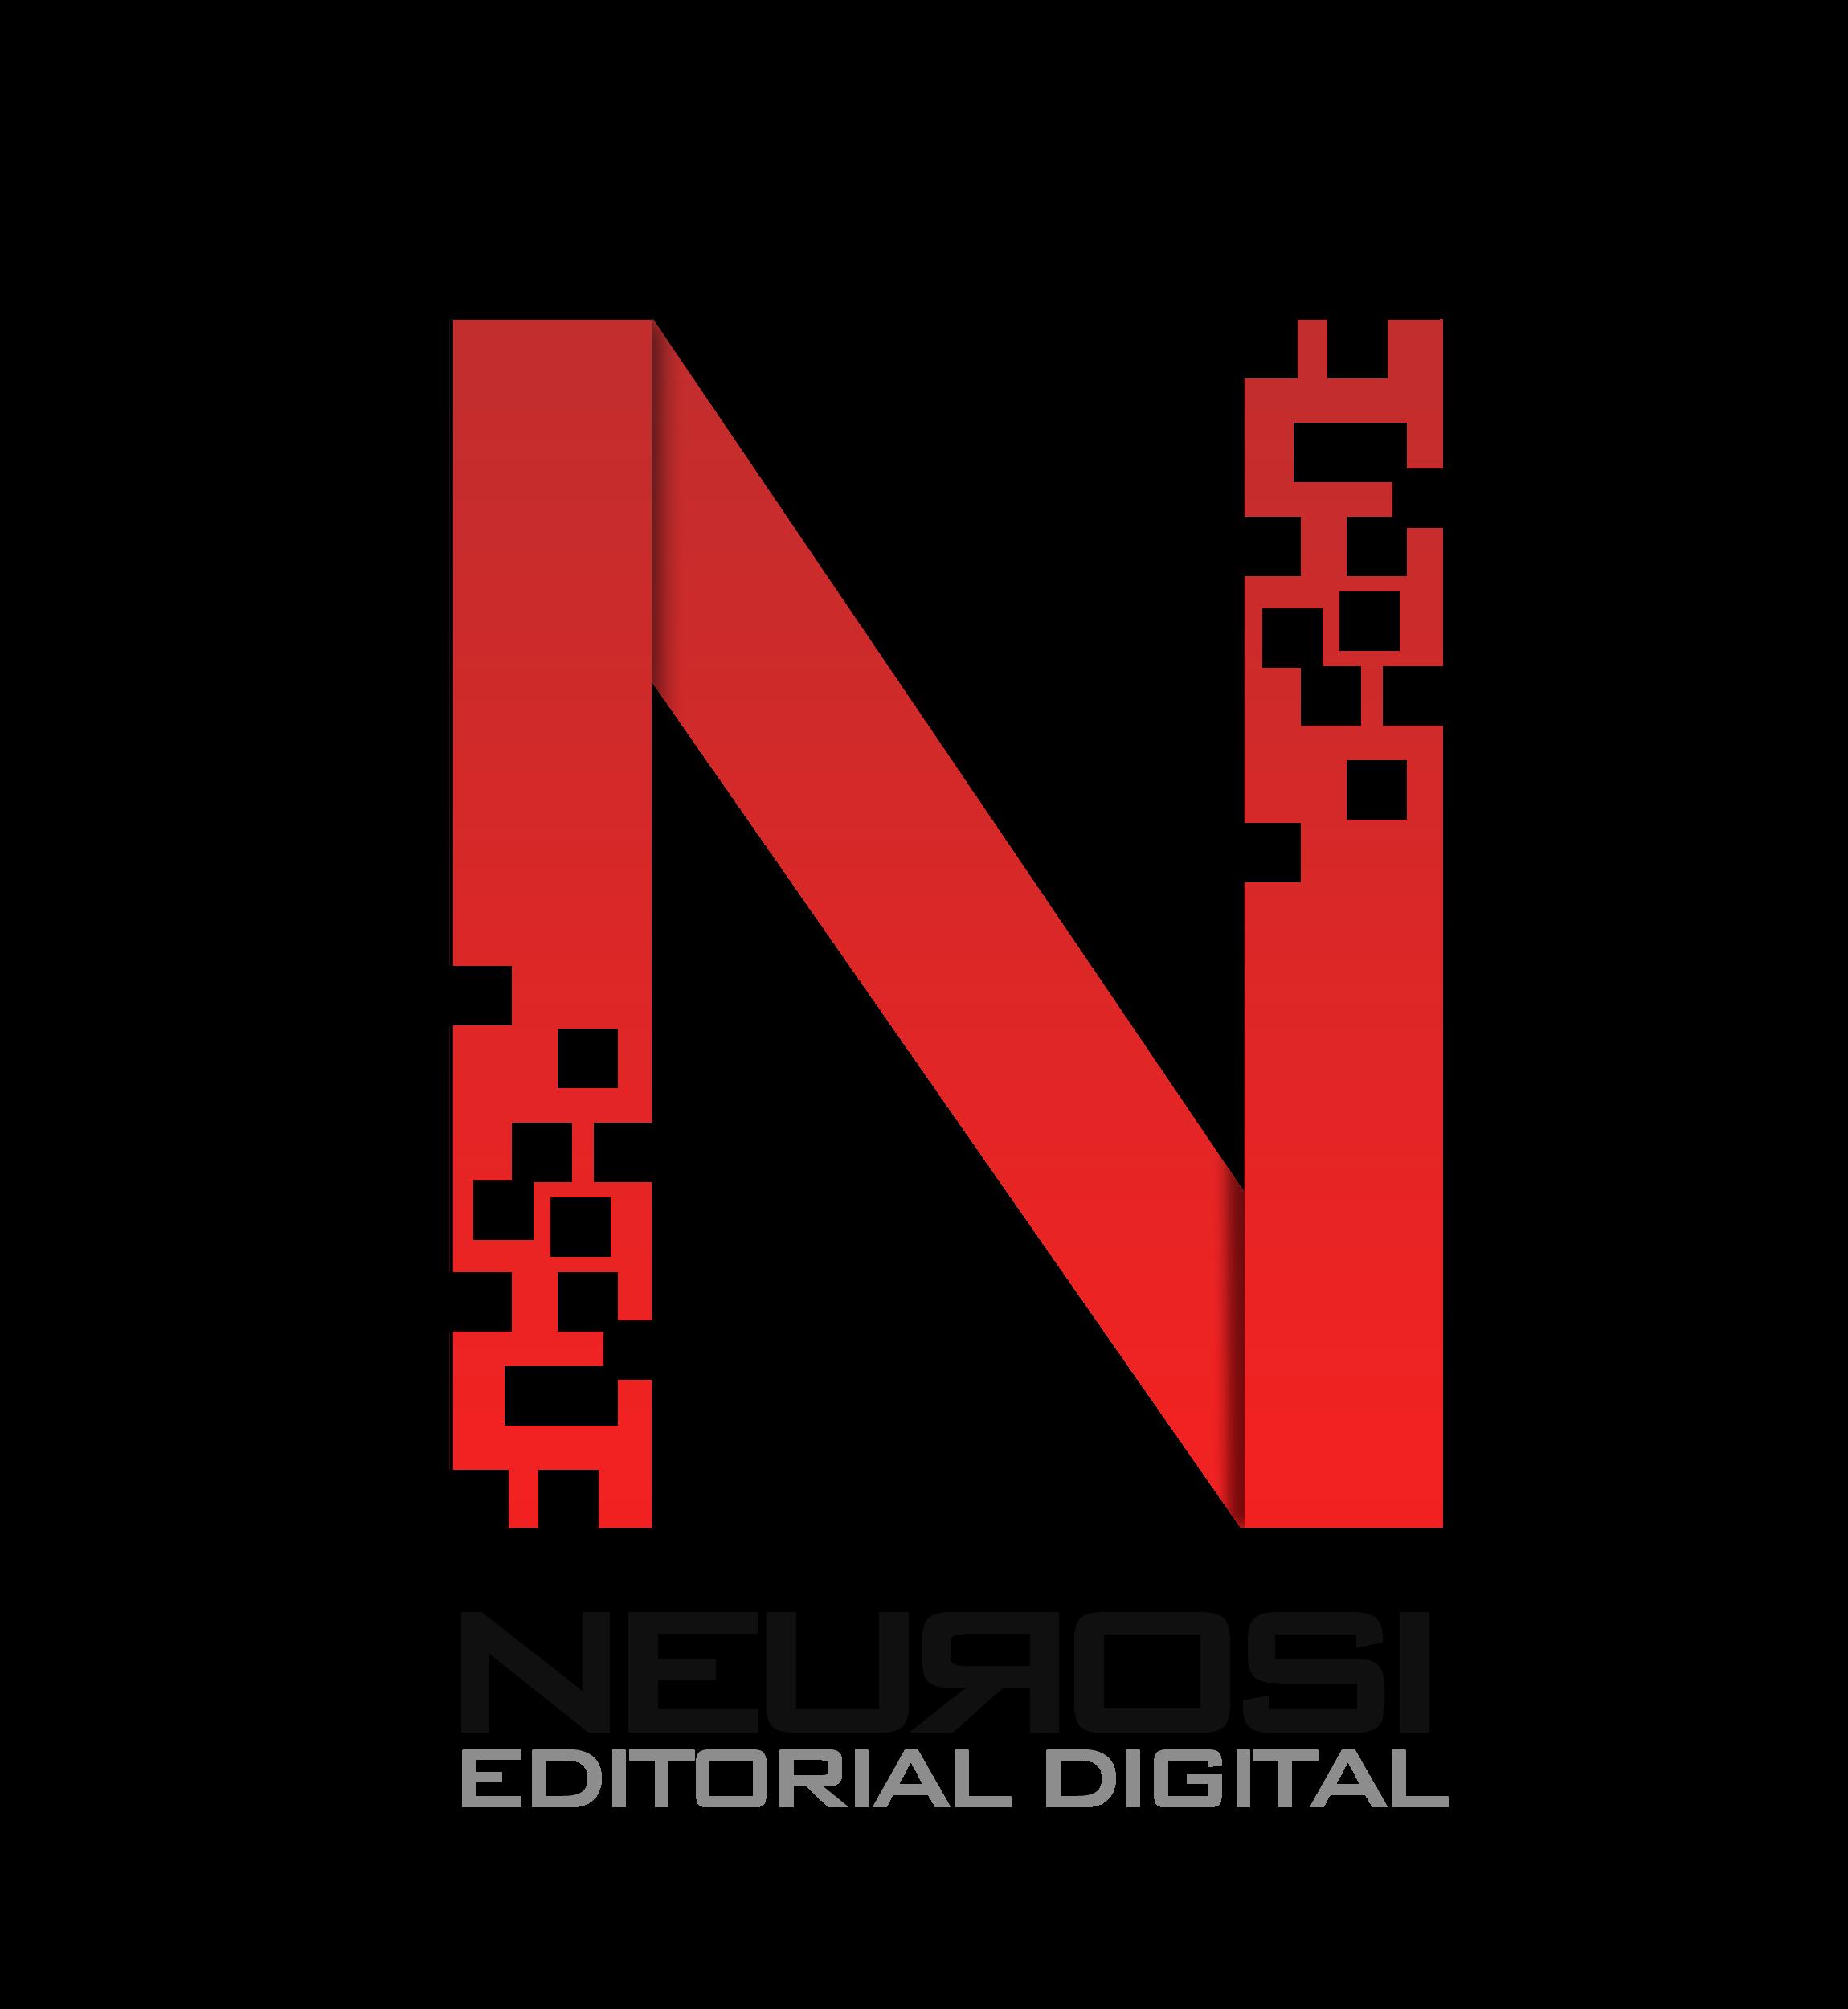 Editorial Neurosi